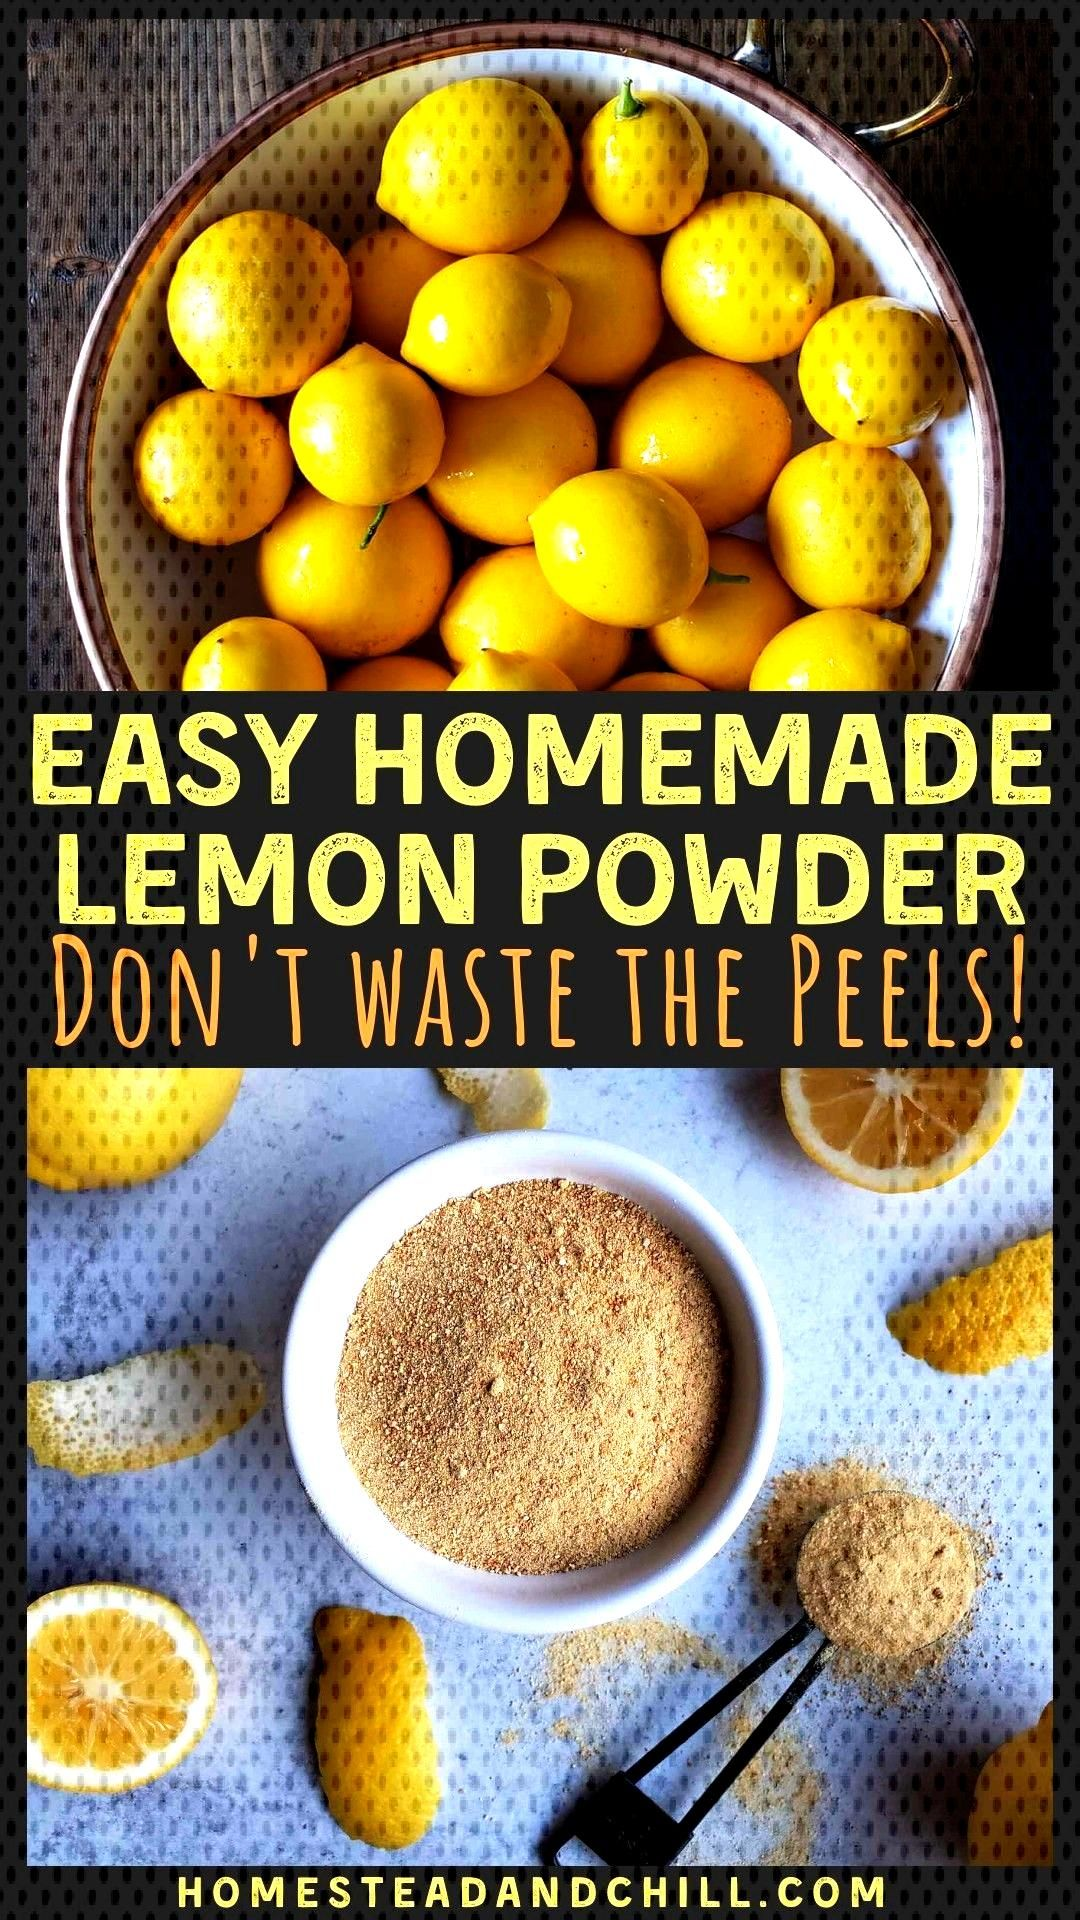 How to Make & Use Lemon Peel Powder ,  How to Make & Use Lemon Peel Powder ,